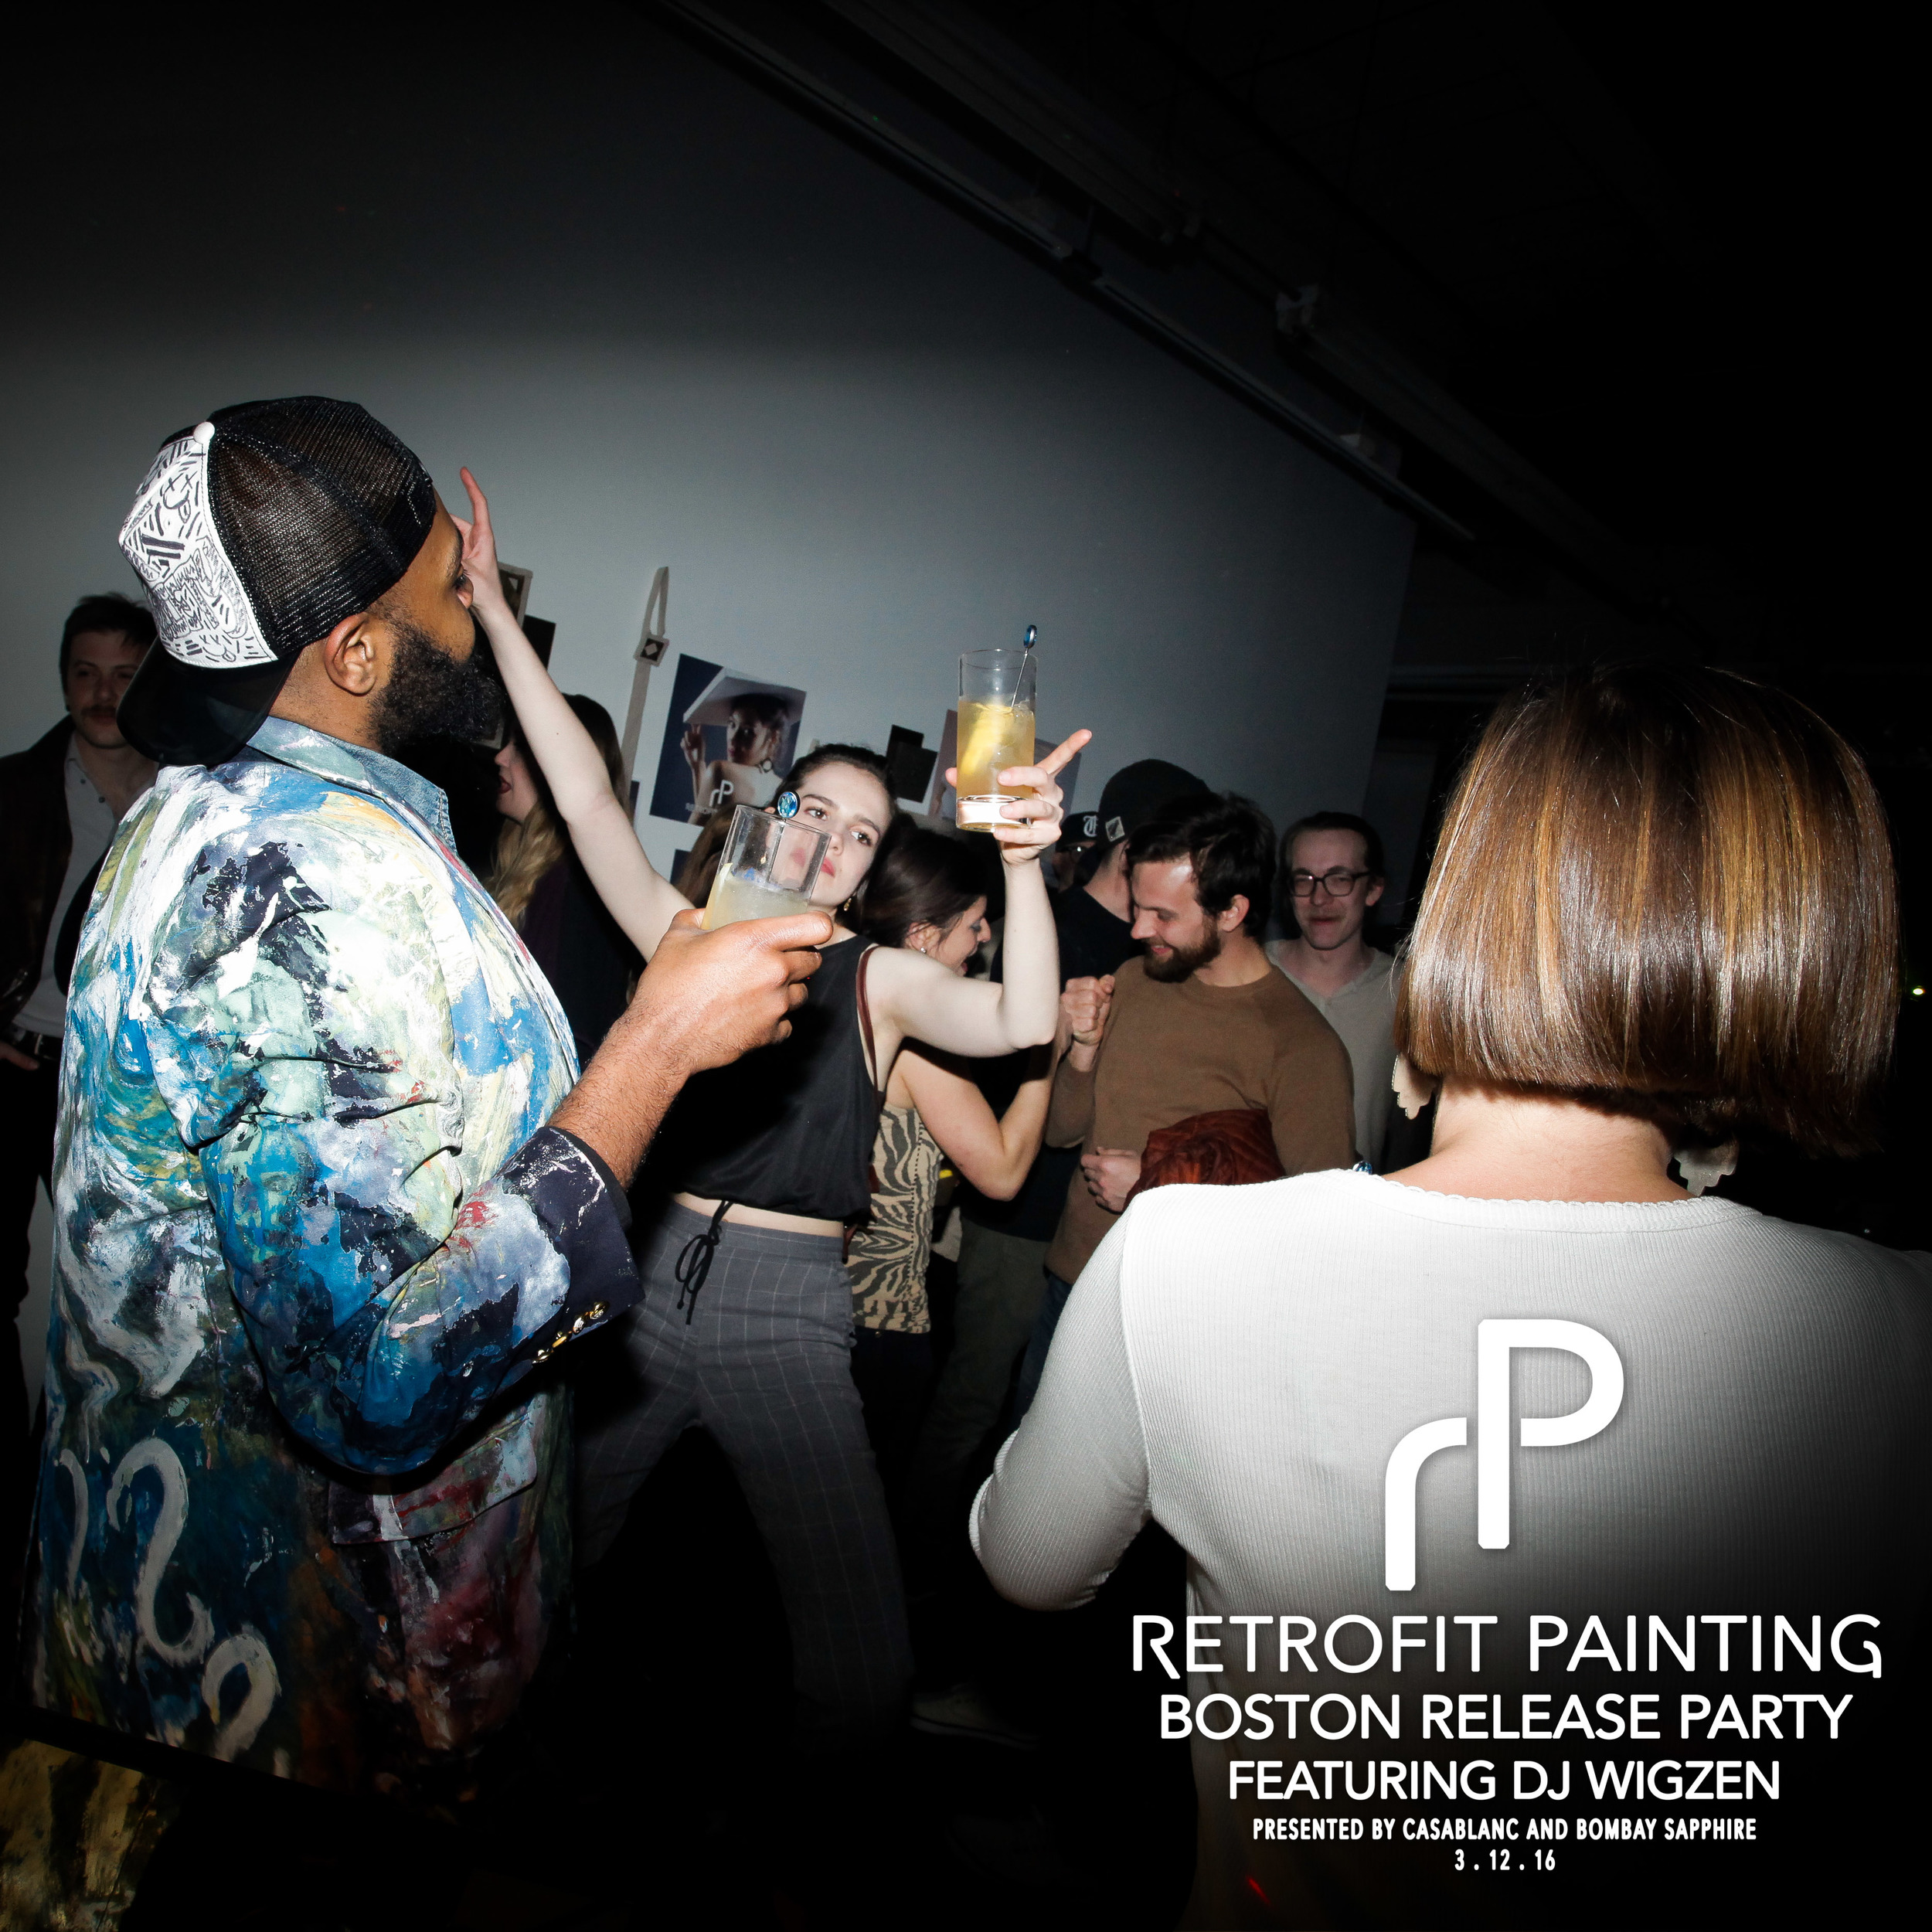 Retrofit Painting Boston Release Party 0148.jpg